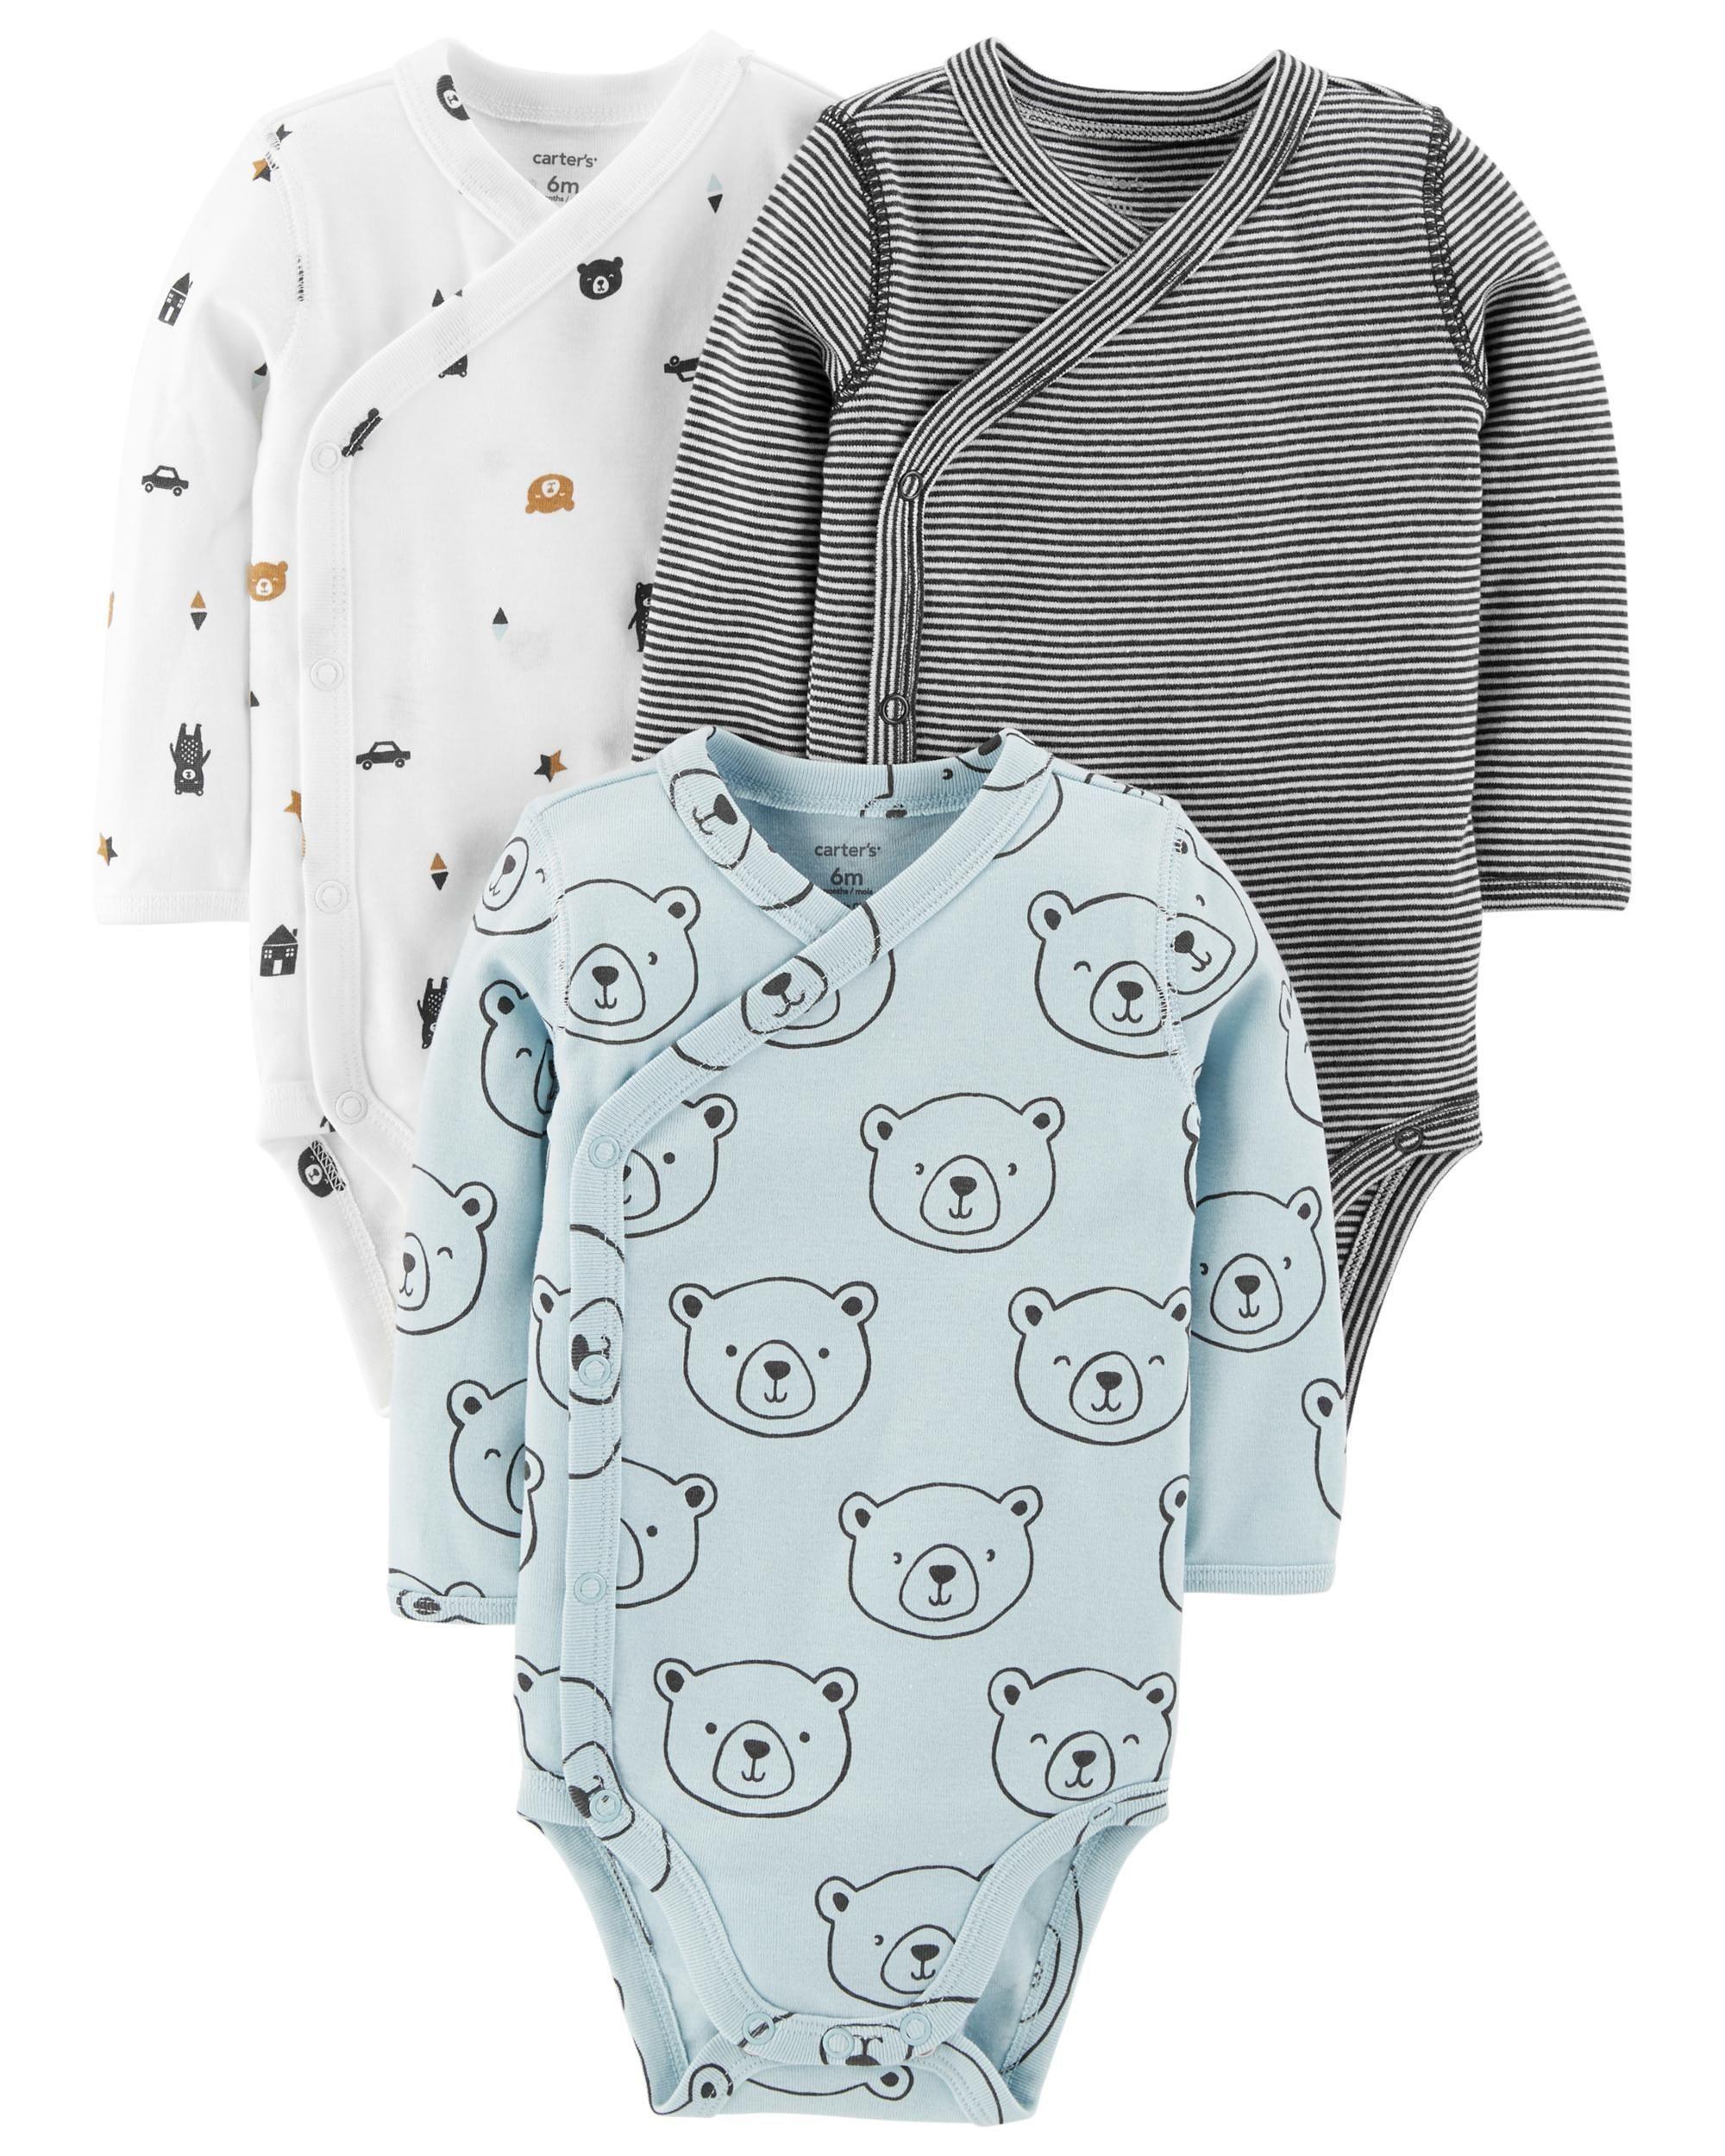 Carters Baby Boys 4-Pack Cotton Kimono Tees